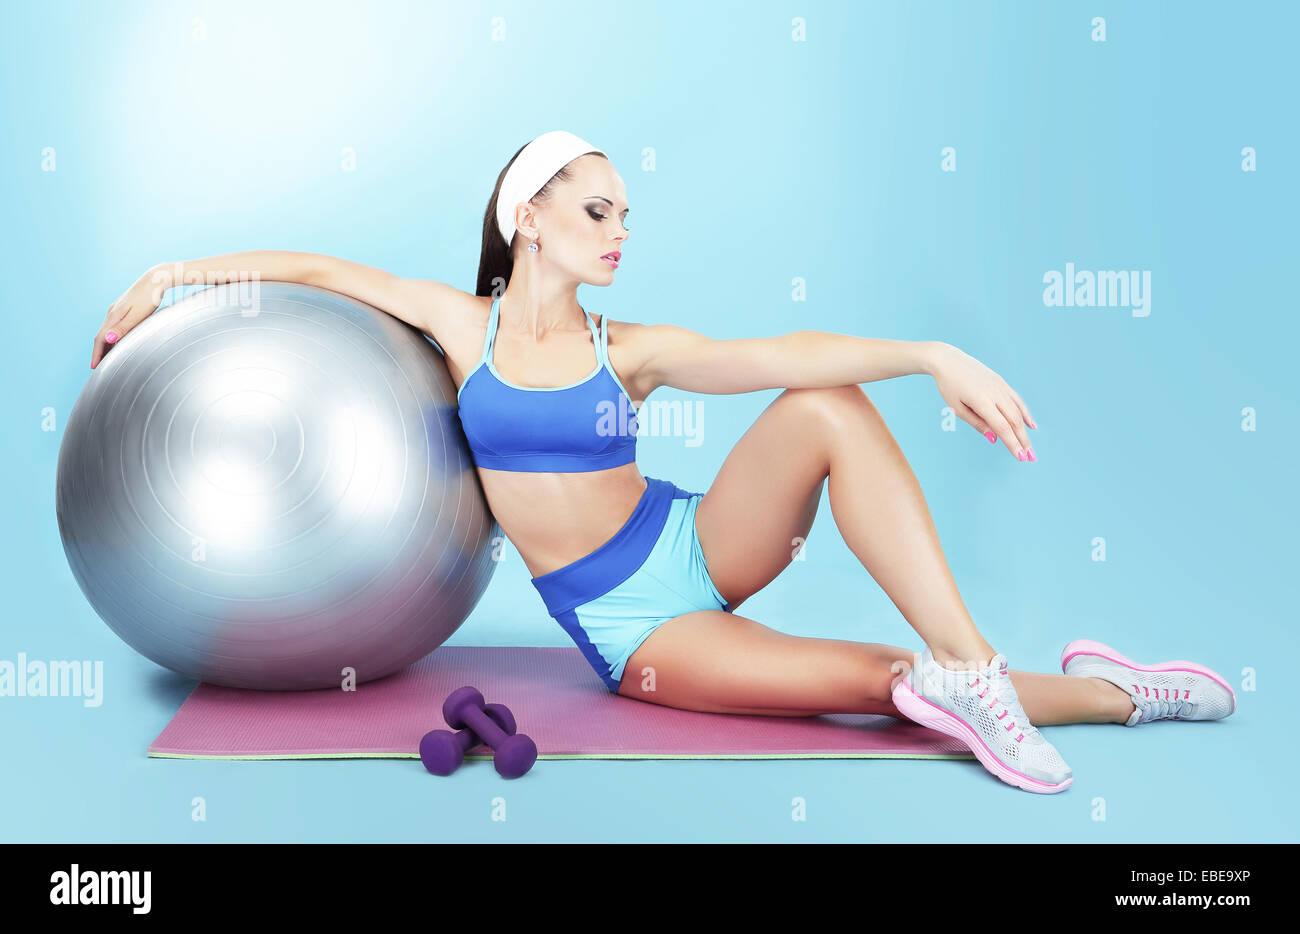 Ruhe. Sportlerin mit Sportgeräten - eine Fitness-Ball und Hanteln Stockbild